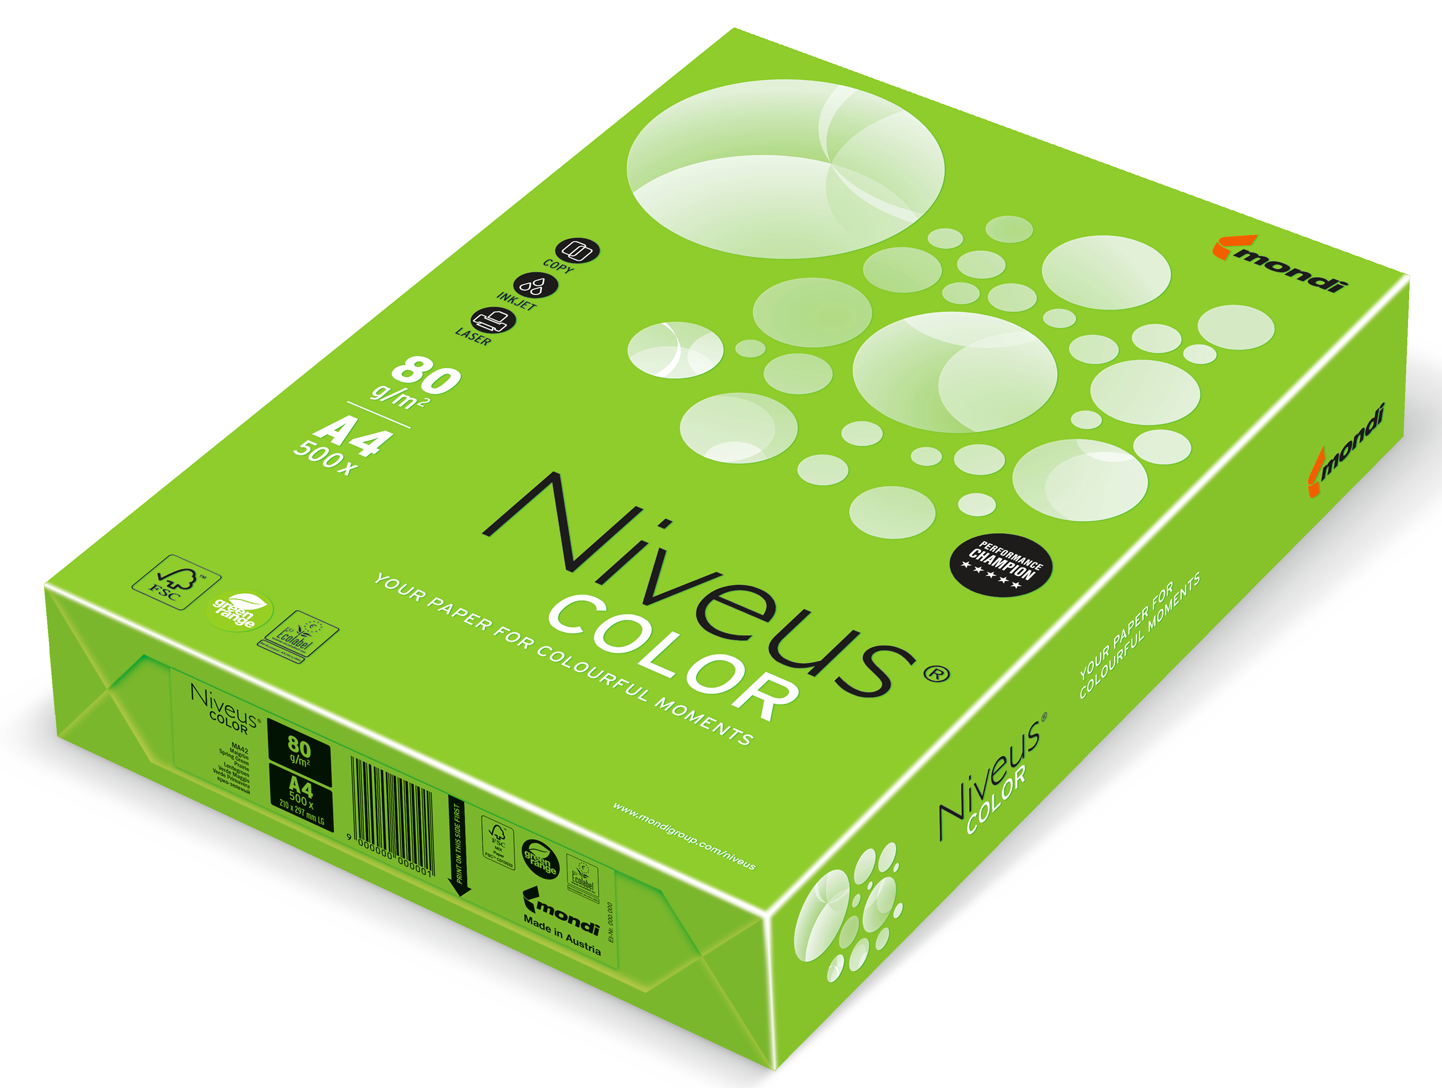 Бумага офисная цветная Niveus NEOGN А4, 80 г/м2, 500 листов, зеленая